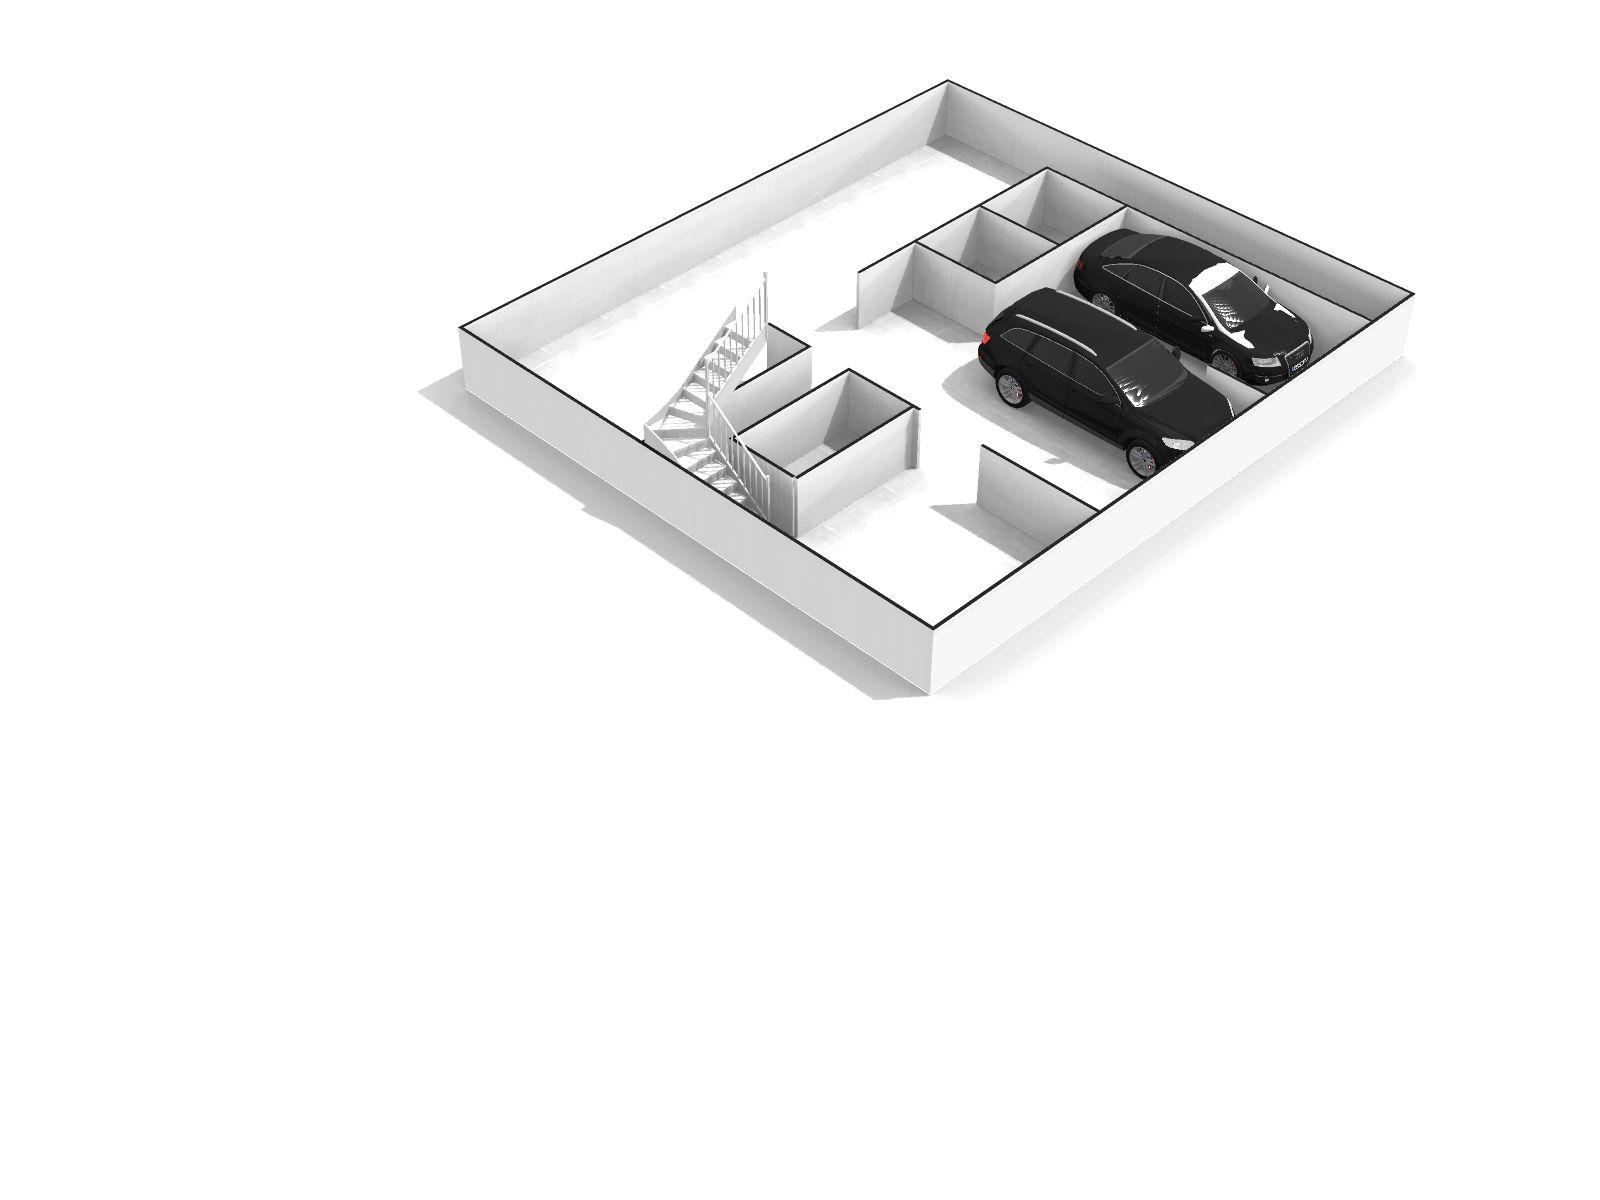 corine boubouillon 2018 homebyme. Black Bedroom Furniture Sets. Home Design Ideas